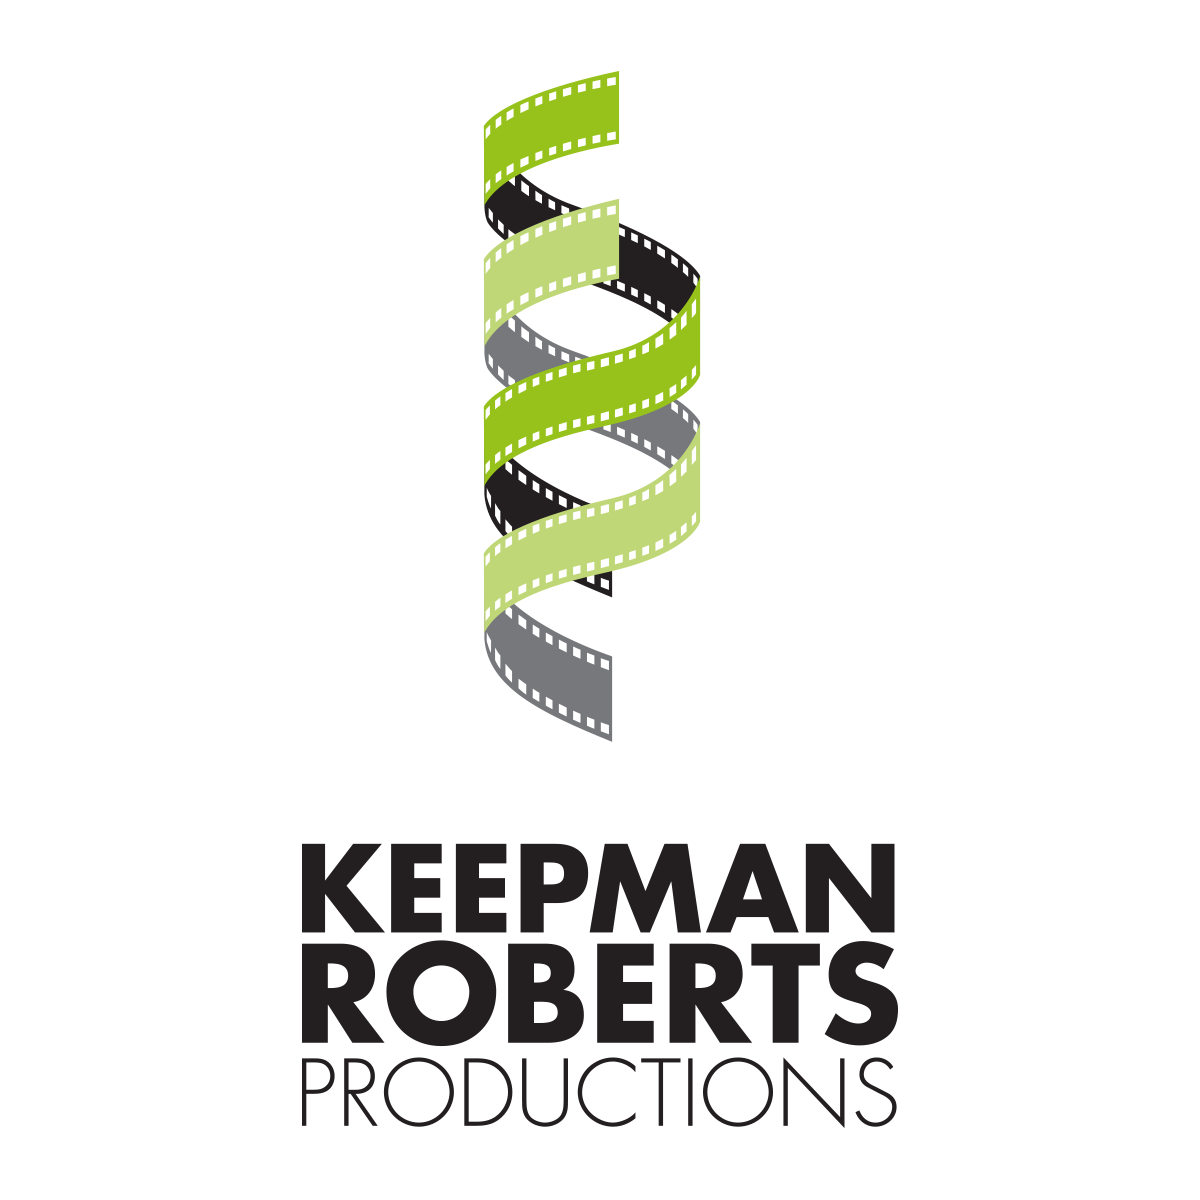 Keepman Robert Productions